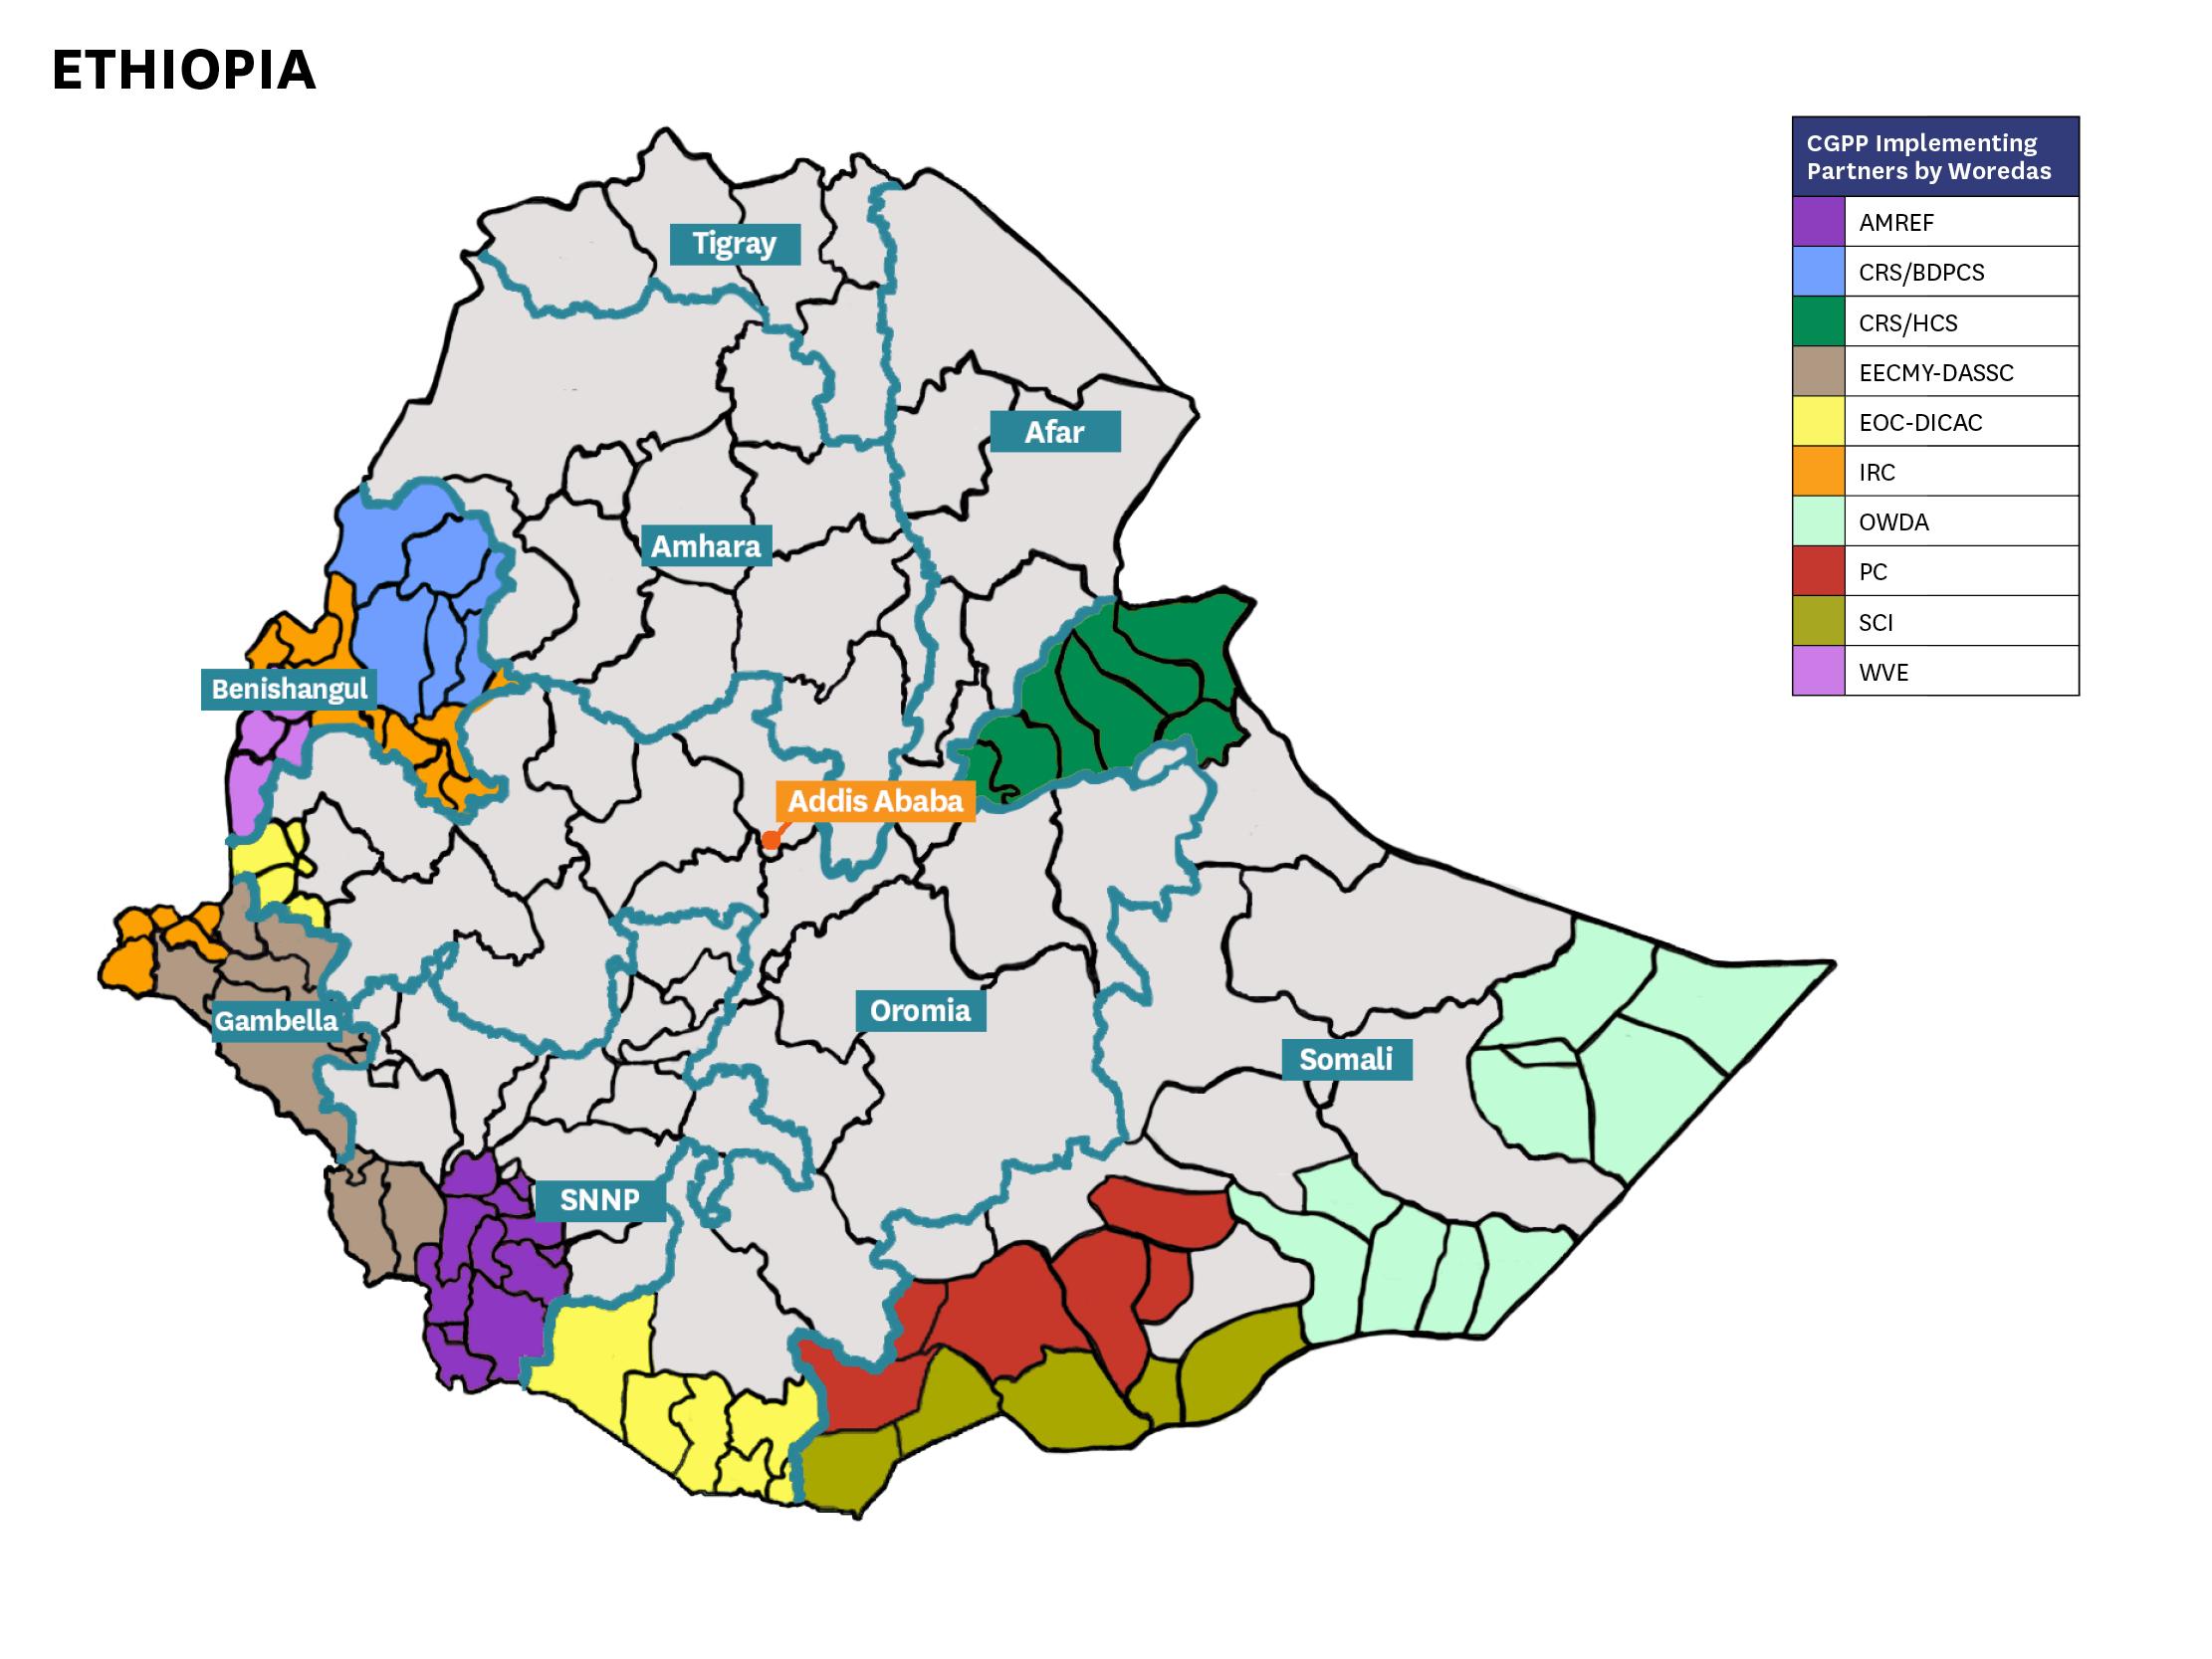 CGPP 2019_Ethiopia